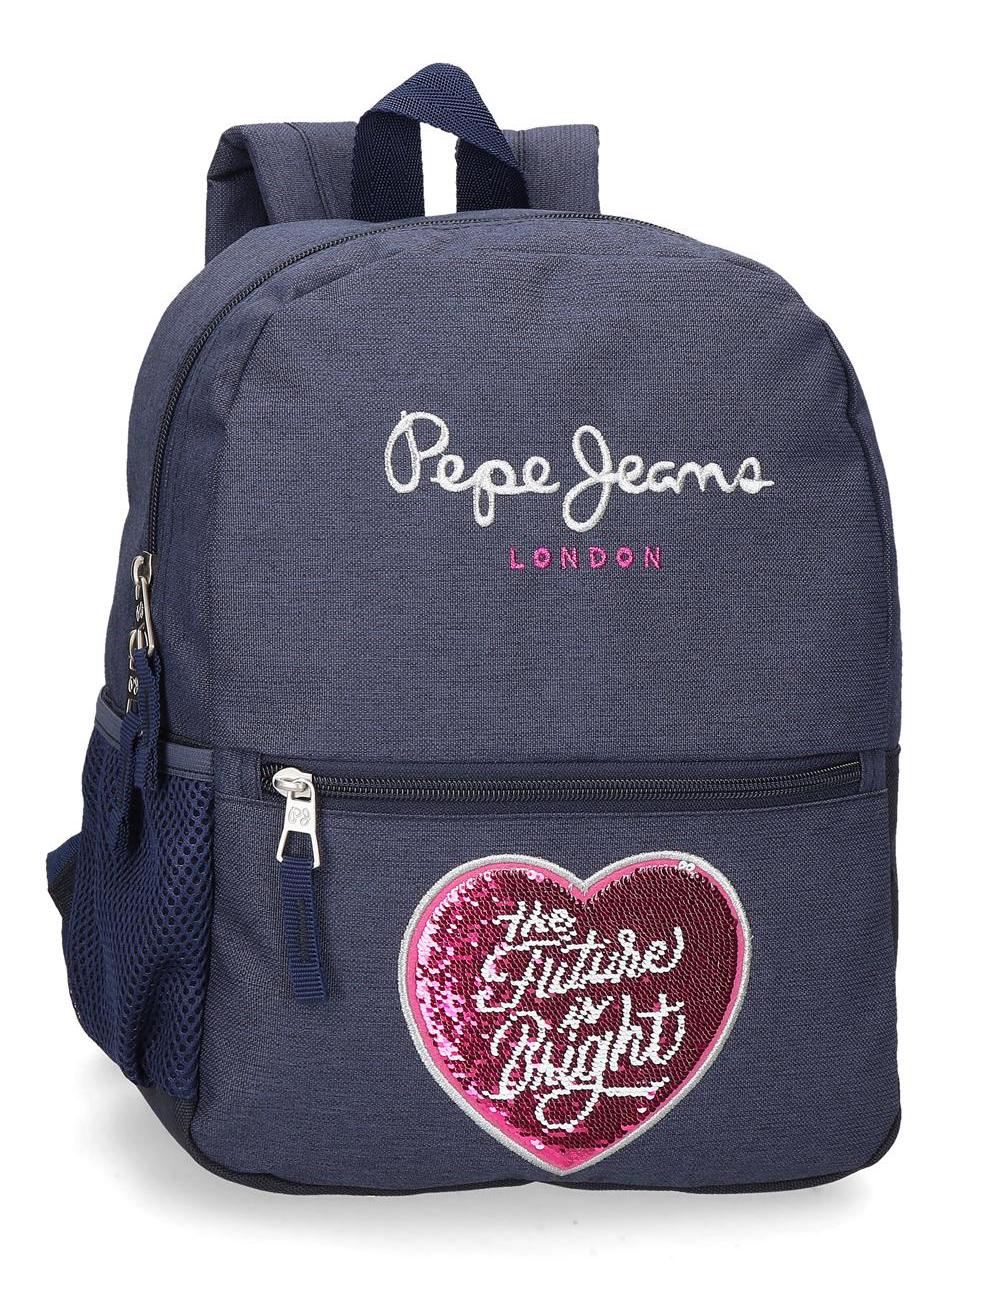 6232121 Mochila Paseo 30 cm Pepe Jeans Bright Marino